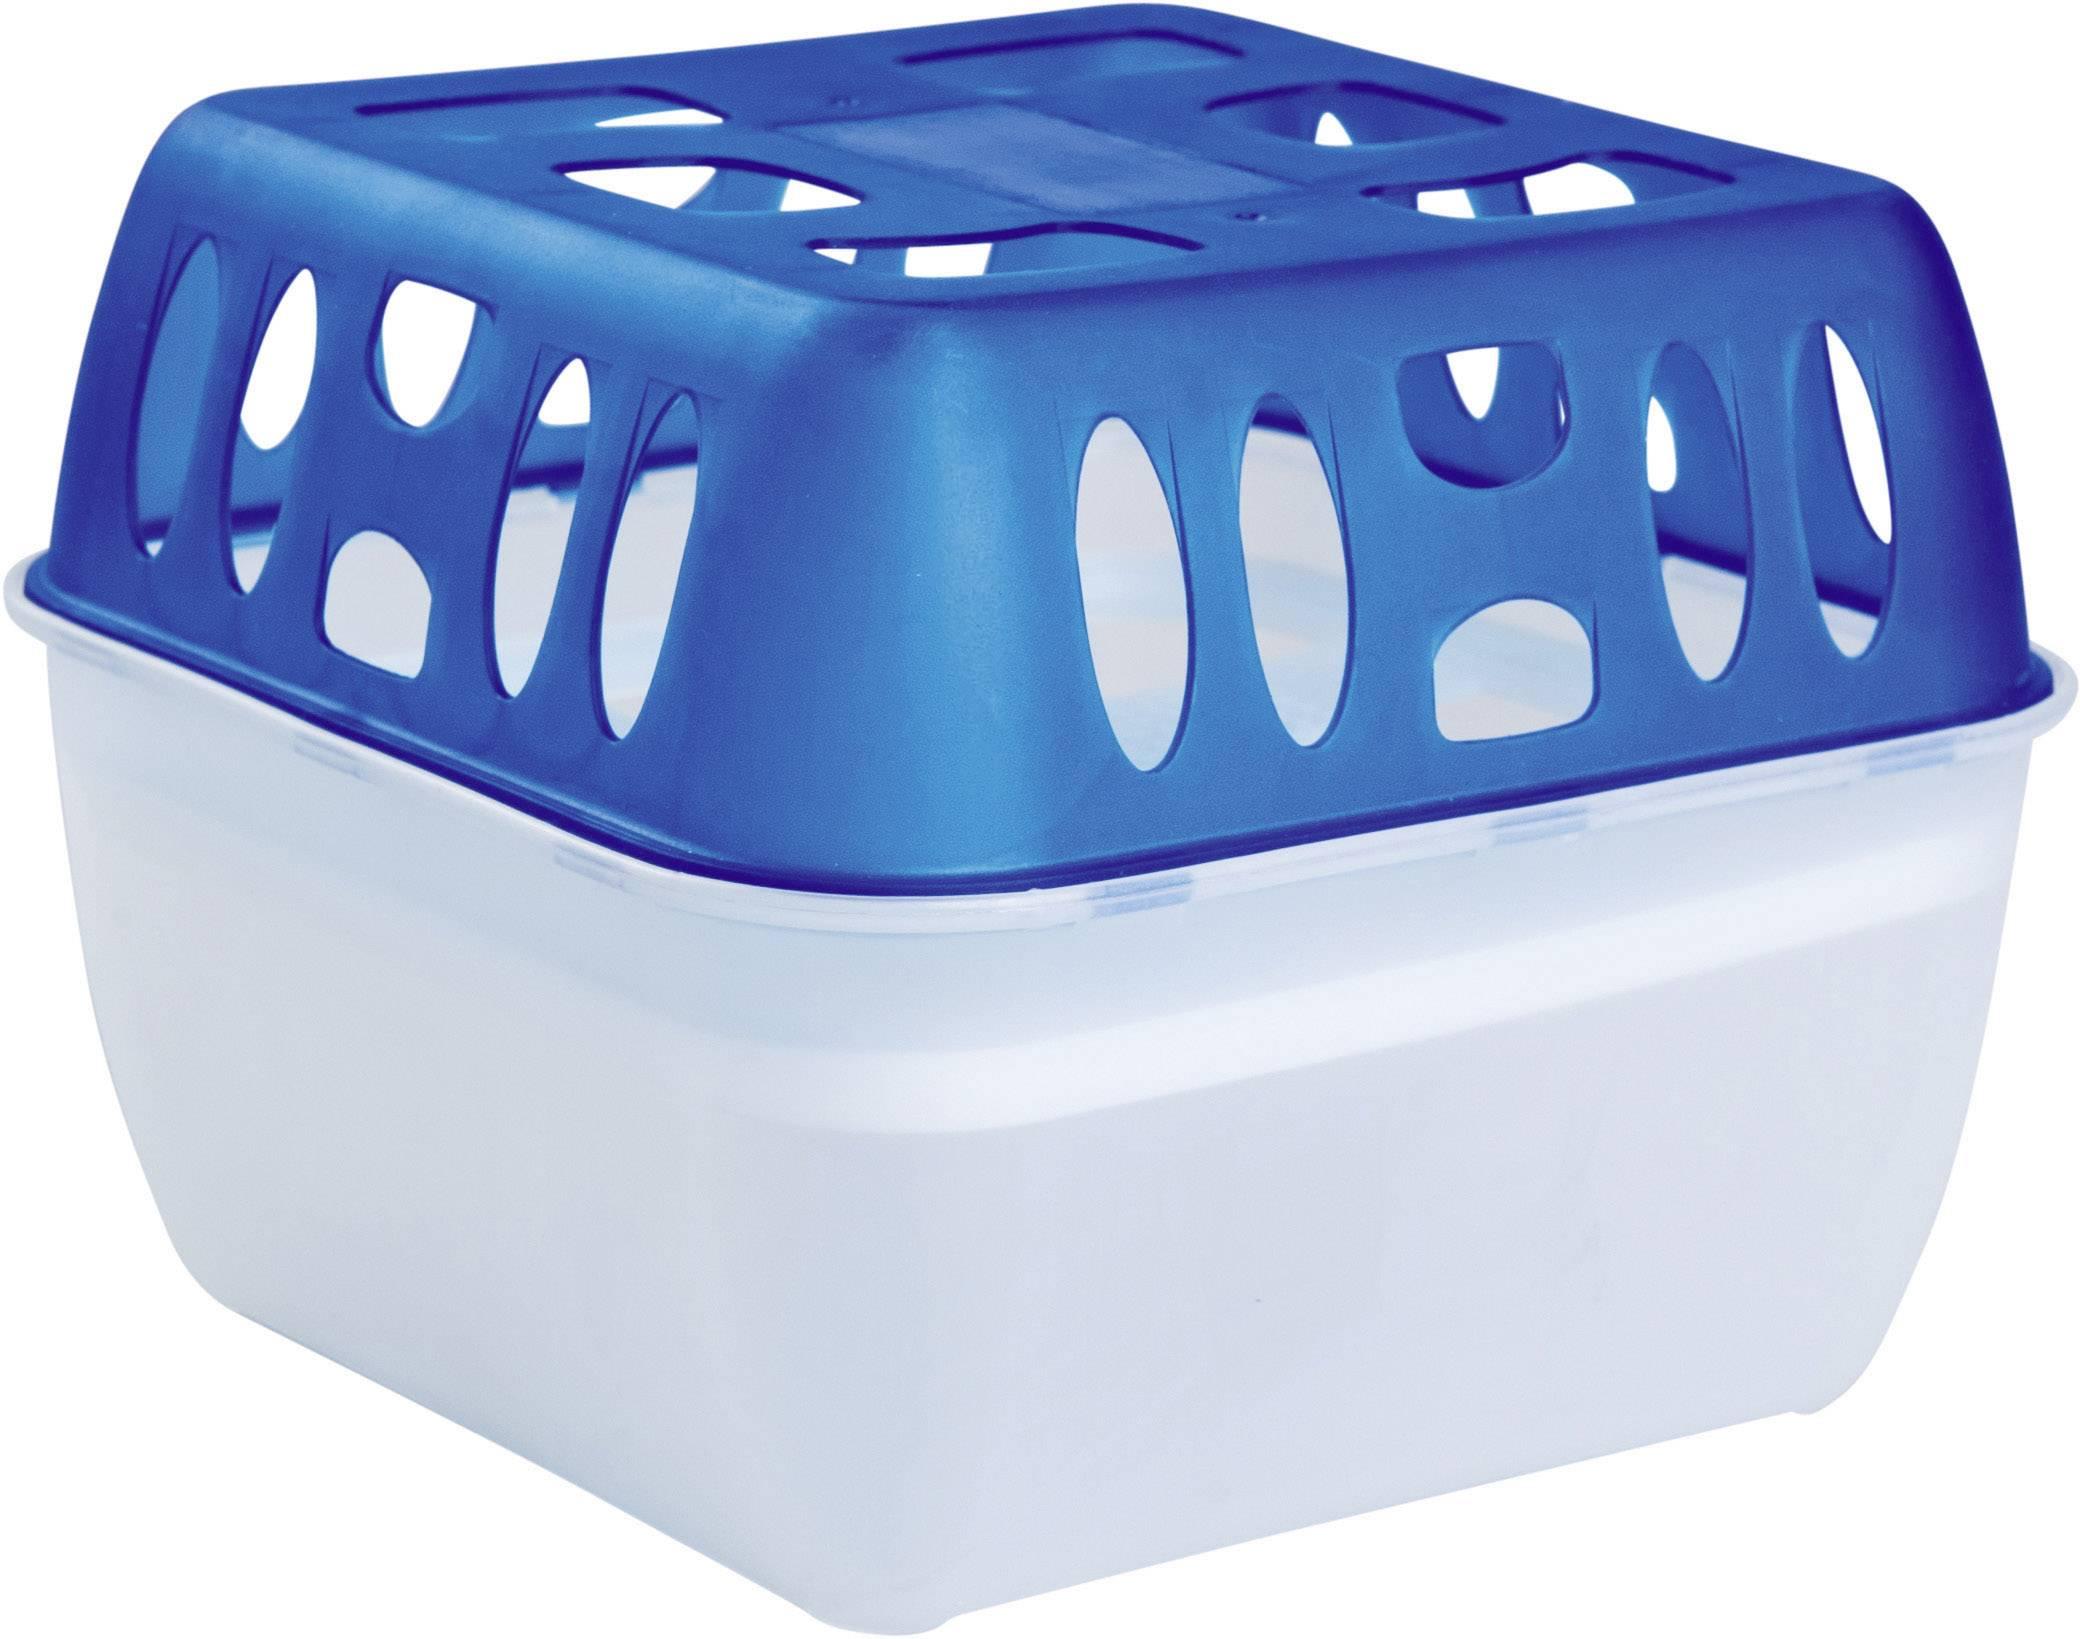 Granulaat-luchtontvochtiger PINGI Profi-Dry 12 m² Blauw-wit | Conrad.nl